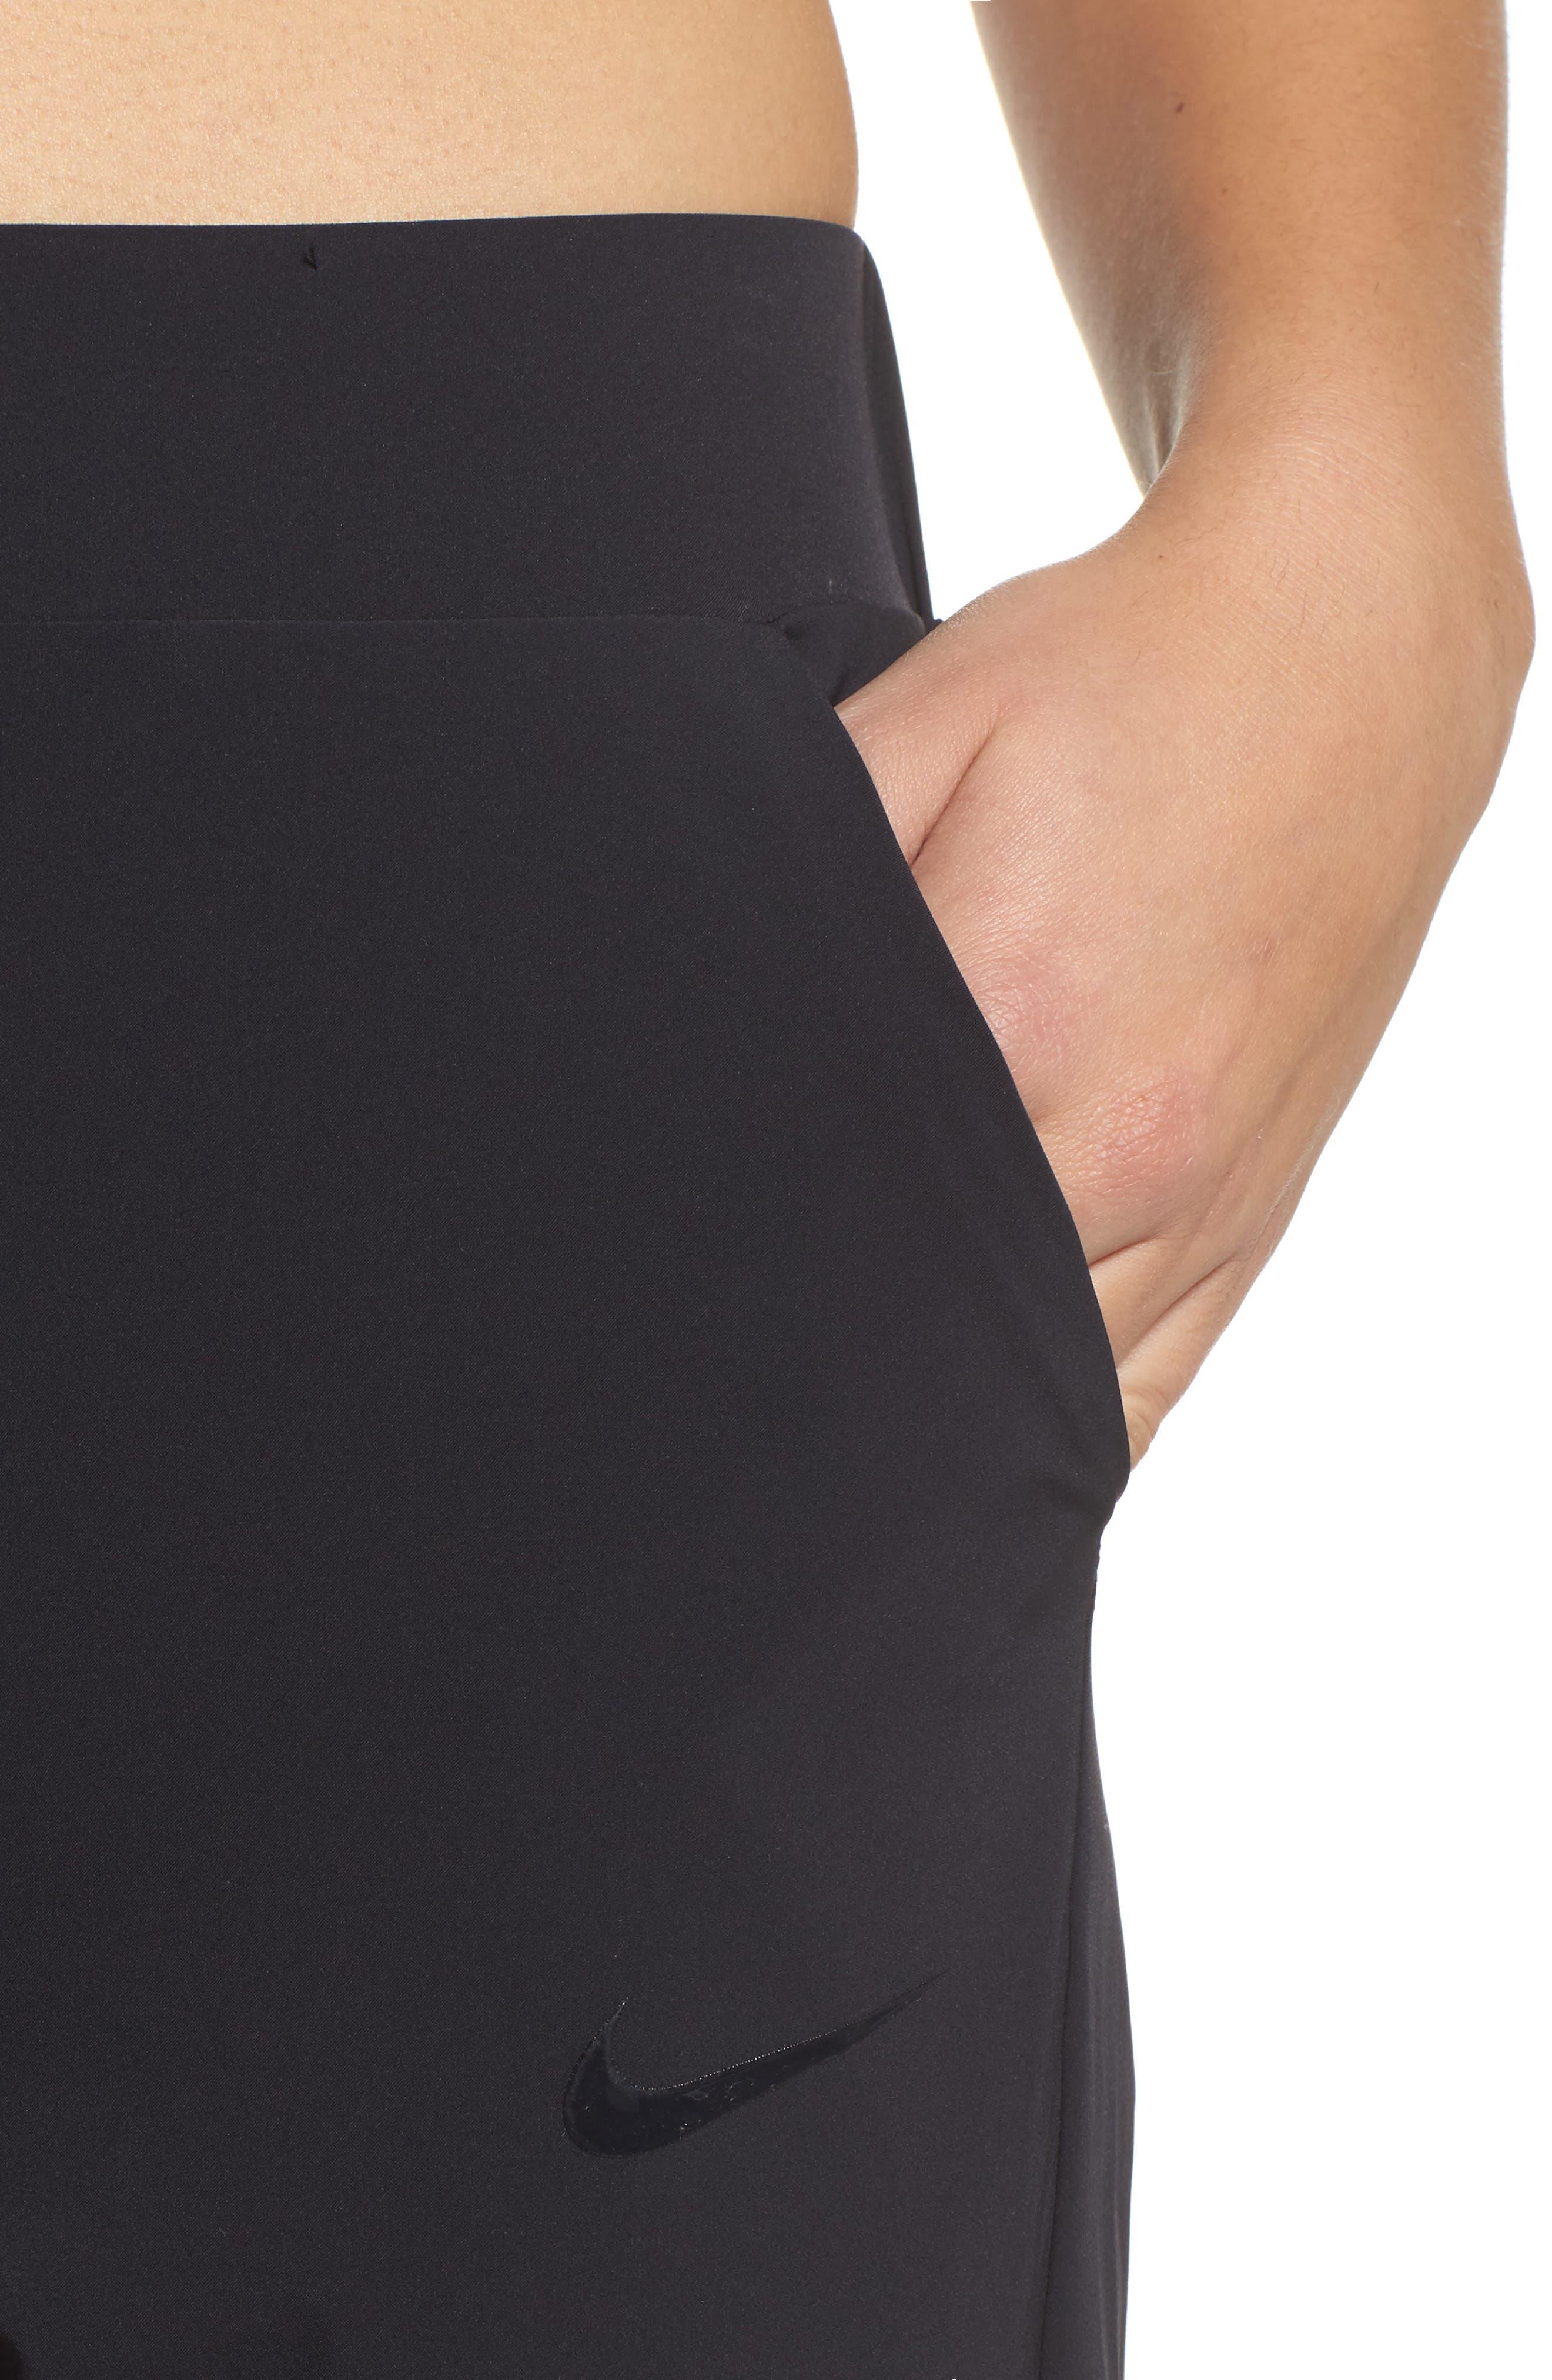 Bliss Training Pants,                             Alternate thumbnail 4, color,                             BLACK/ CLEAR